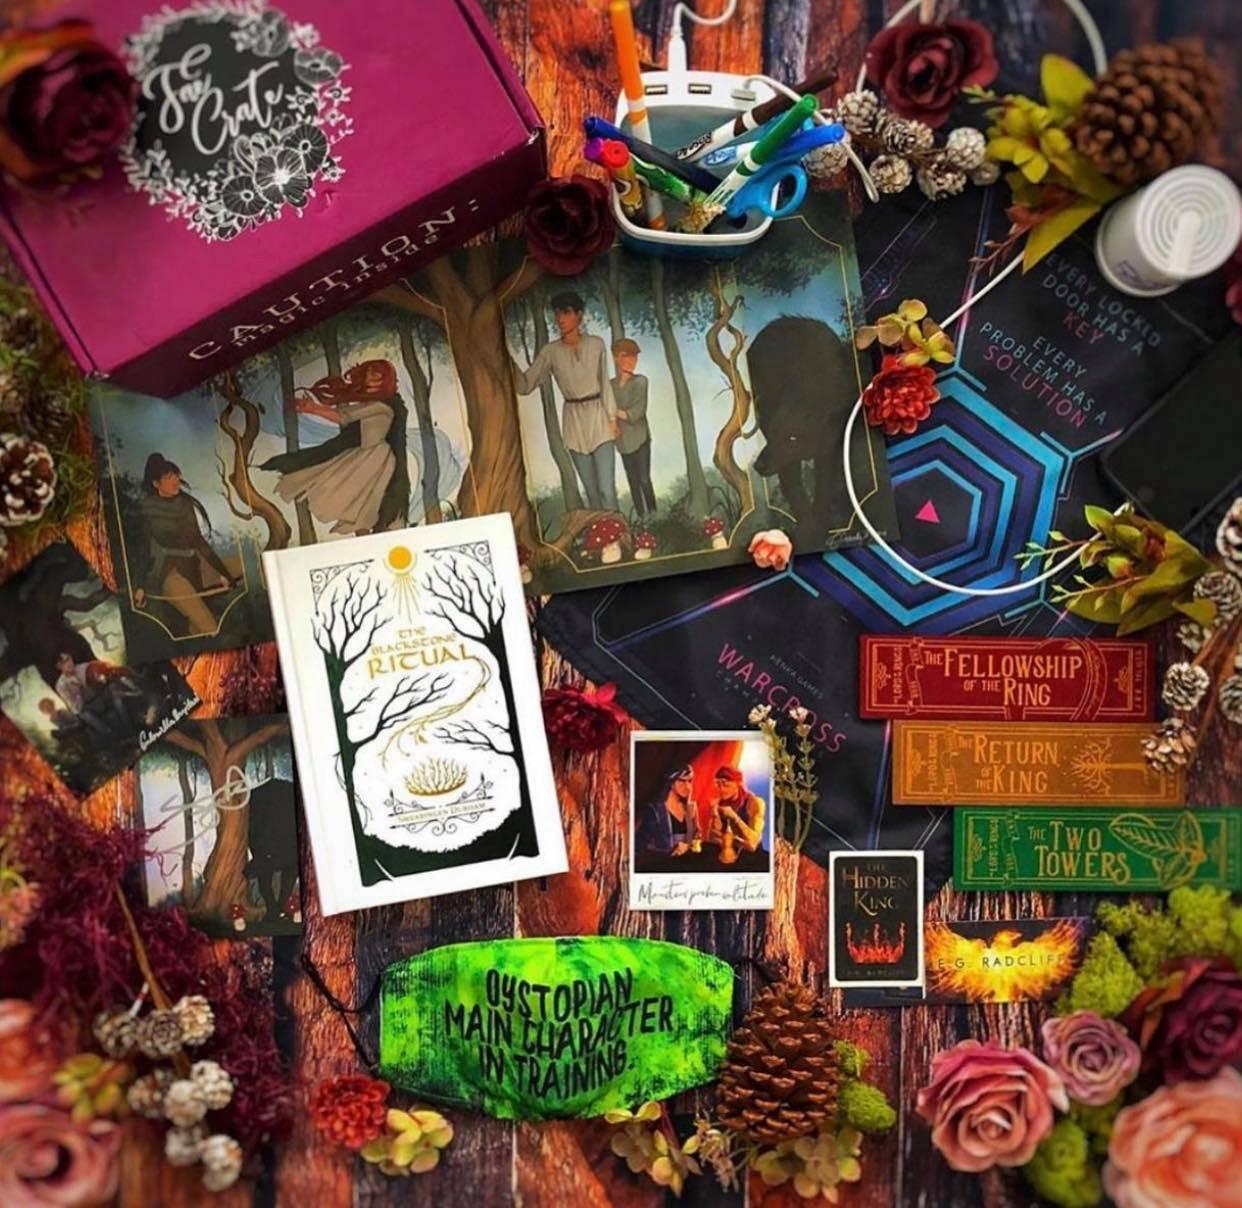 September 2020 Alliance box theme includes The Blackstone Ritual by Swearingen Durham, WHTF Polaroid, Dystopian MC in Training Face Mask, LOTR Felt Bookmar Set, Red Rising Bucket Organizer Light, Stolen Songbird Speaker, Warcross Wall Hanging, A Song Below Water Olympian Art Print, and Iron Fey Shirt.